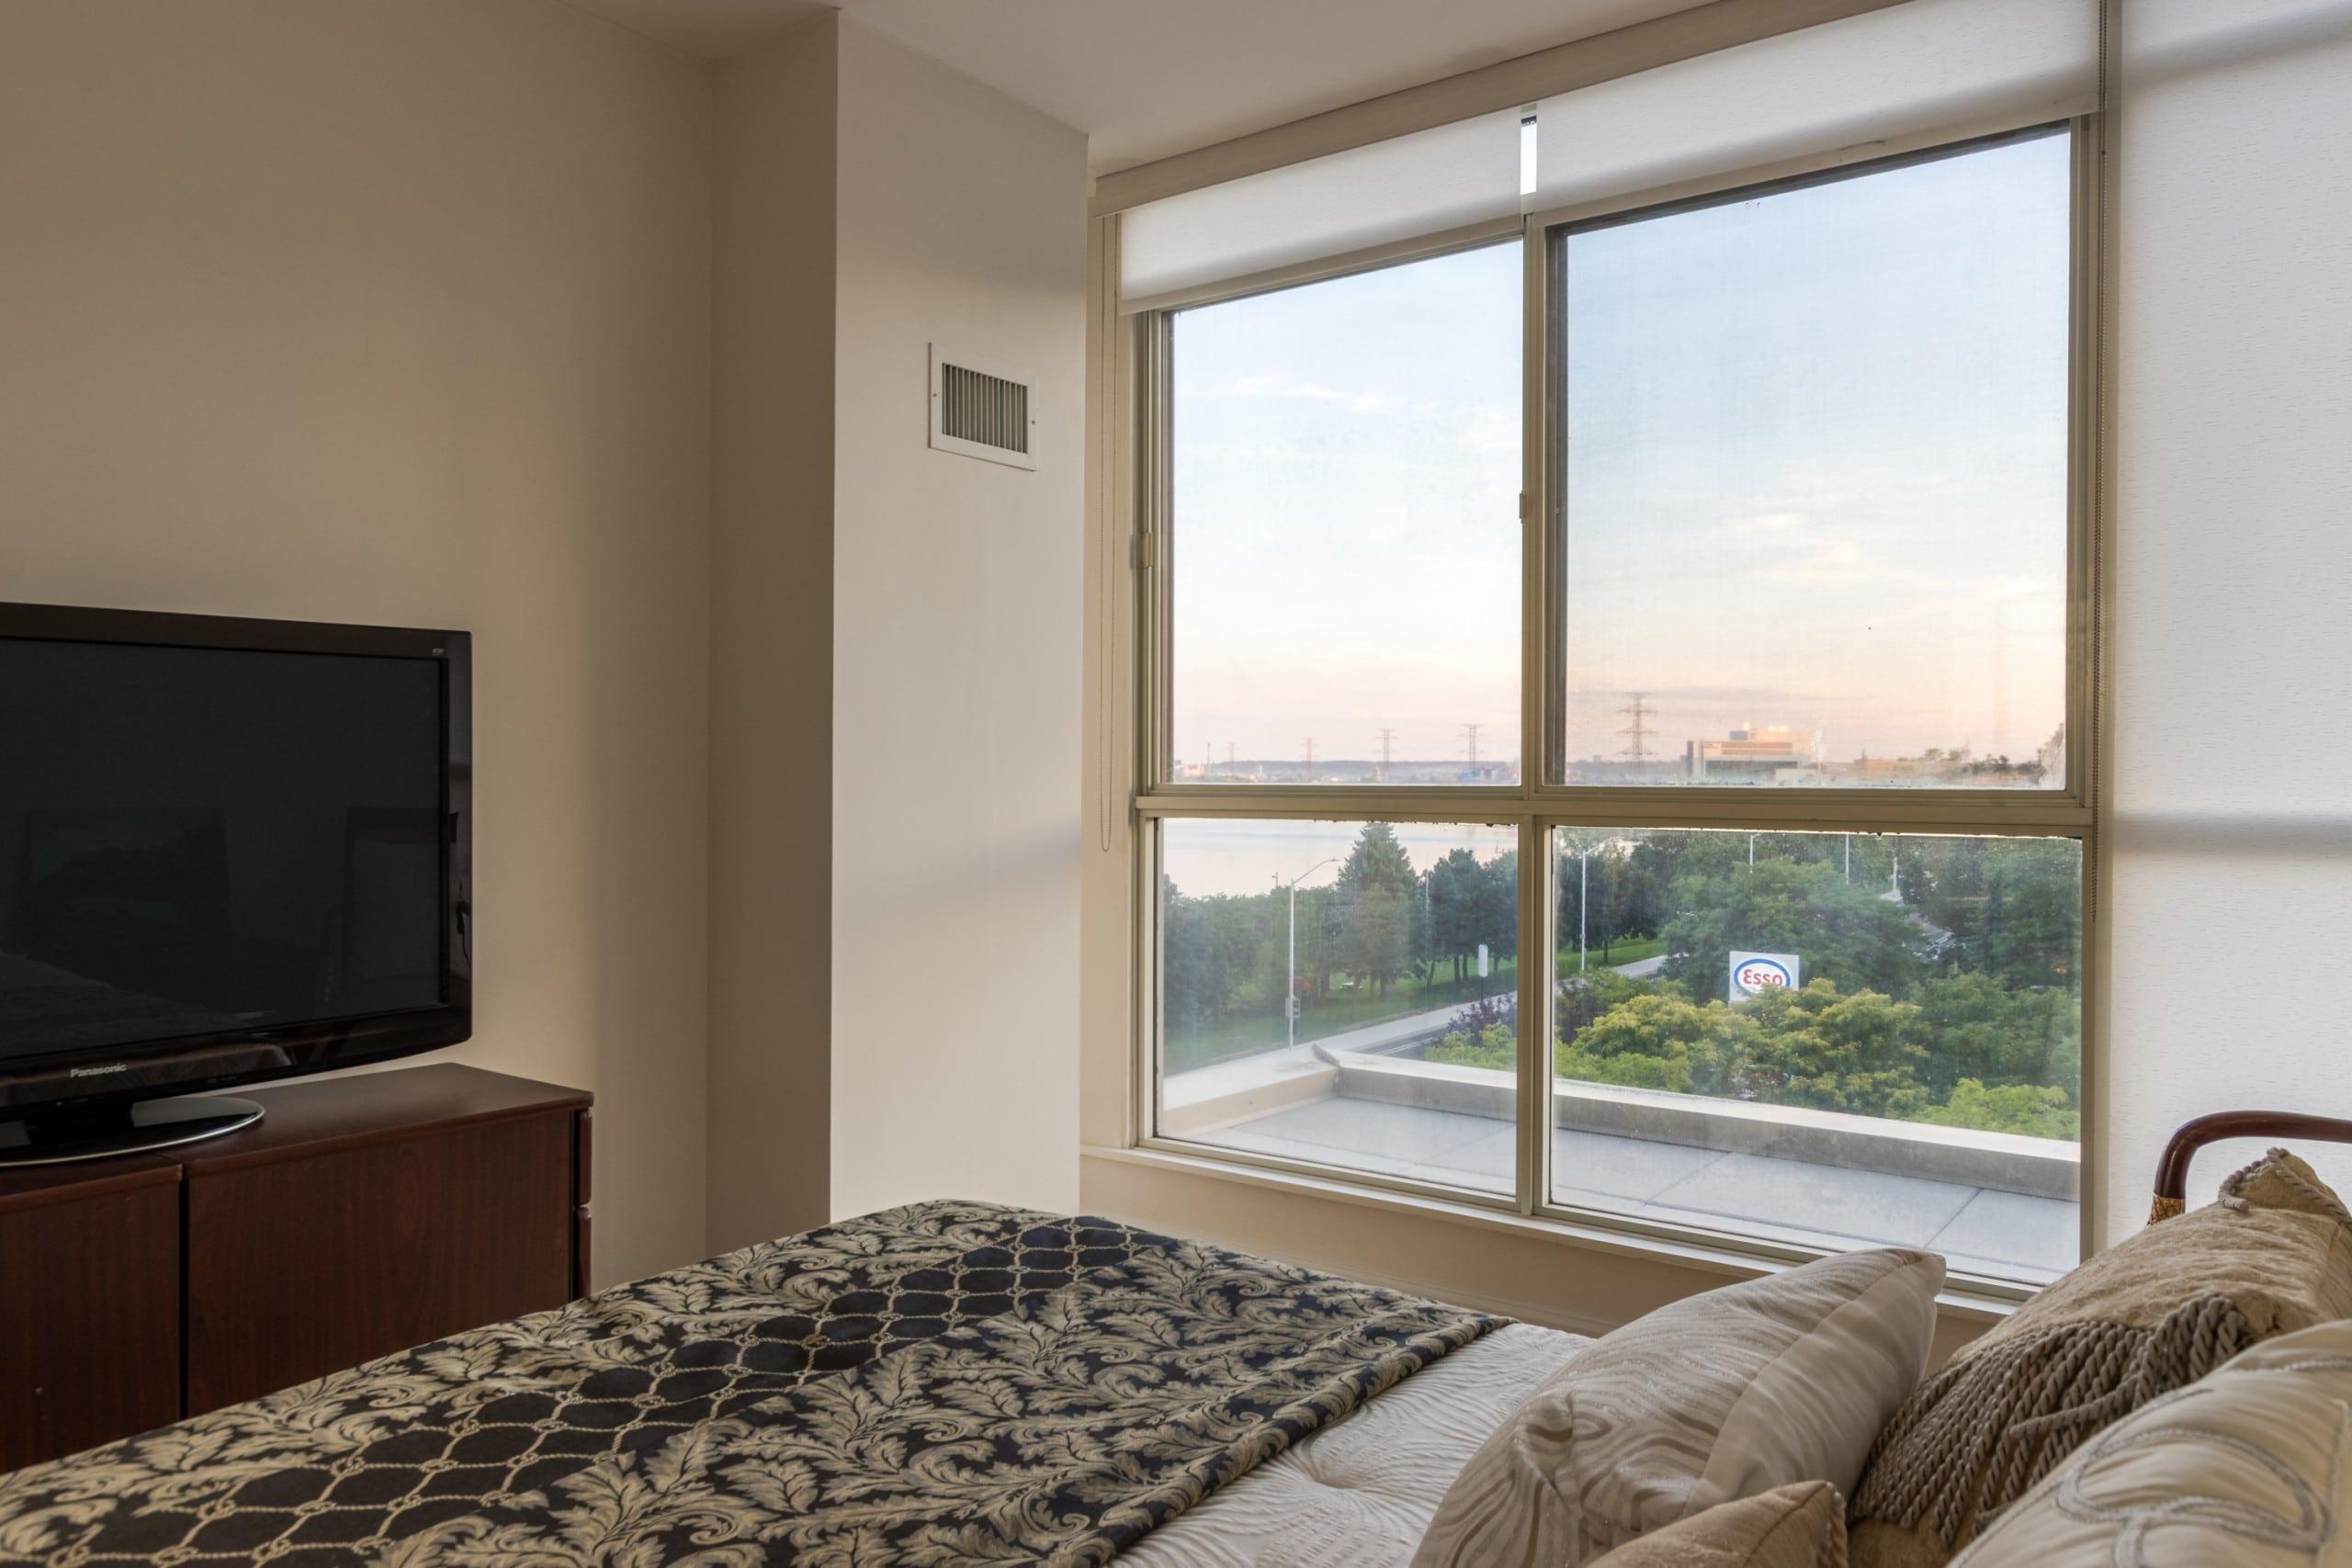 Bedroom featured at 508 – 415 Locust Street, Burlington, ON at Alex Irish & Associates